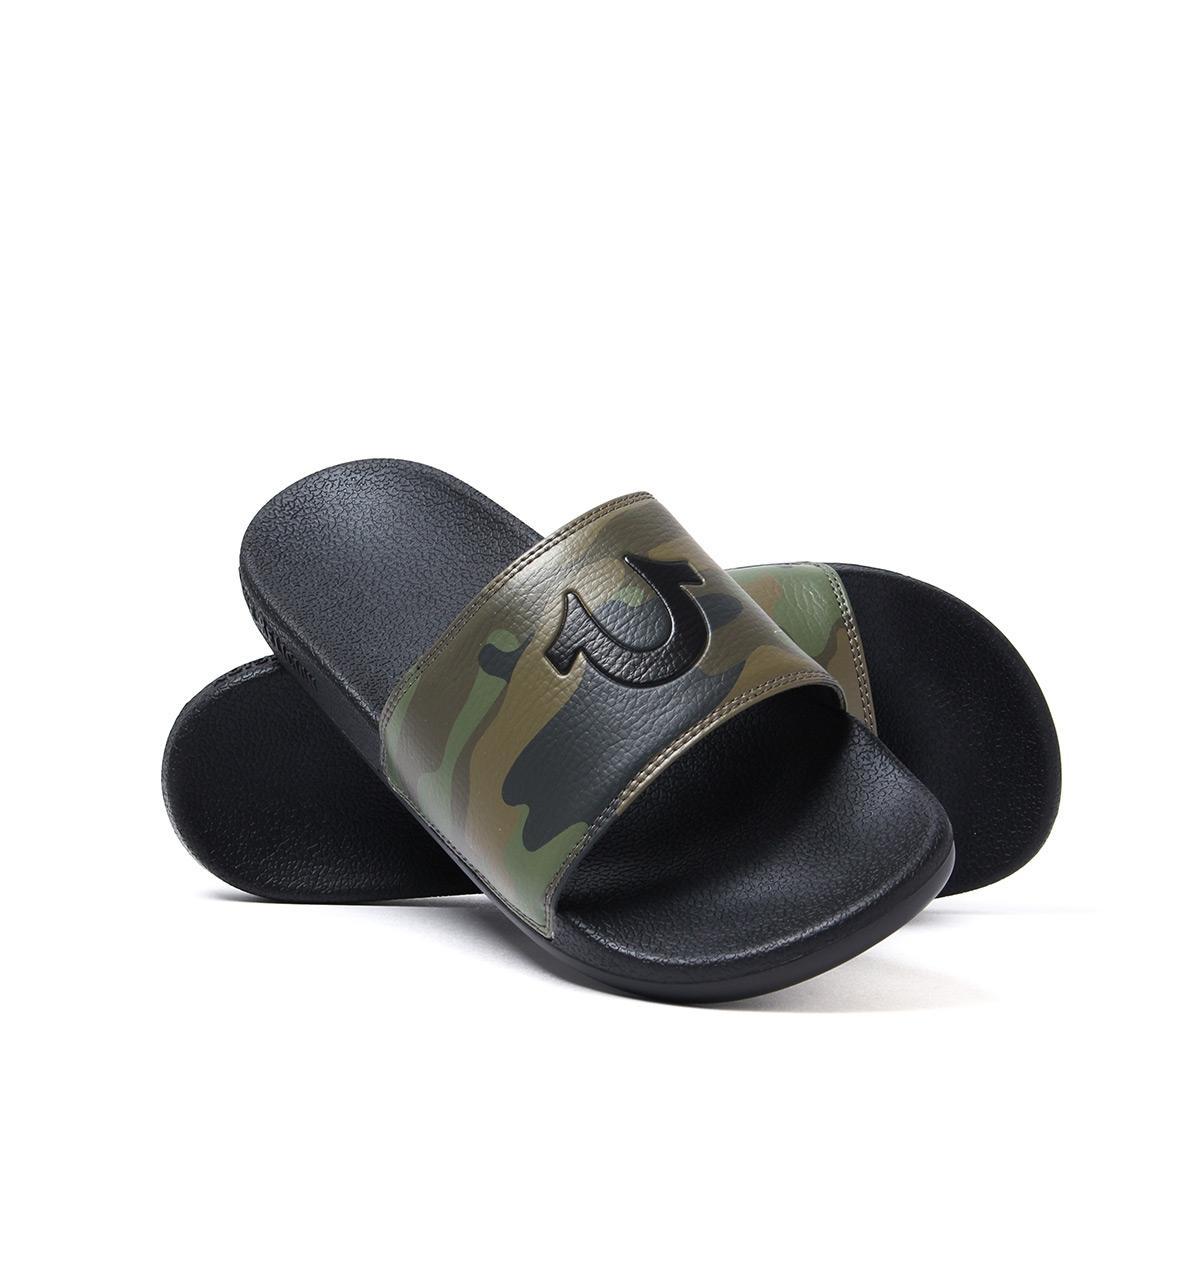 0eba2d32e082 True Religion Camo   Black Pool Slides With Woven Carry Bag in Black ...